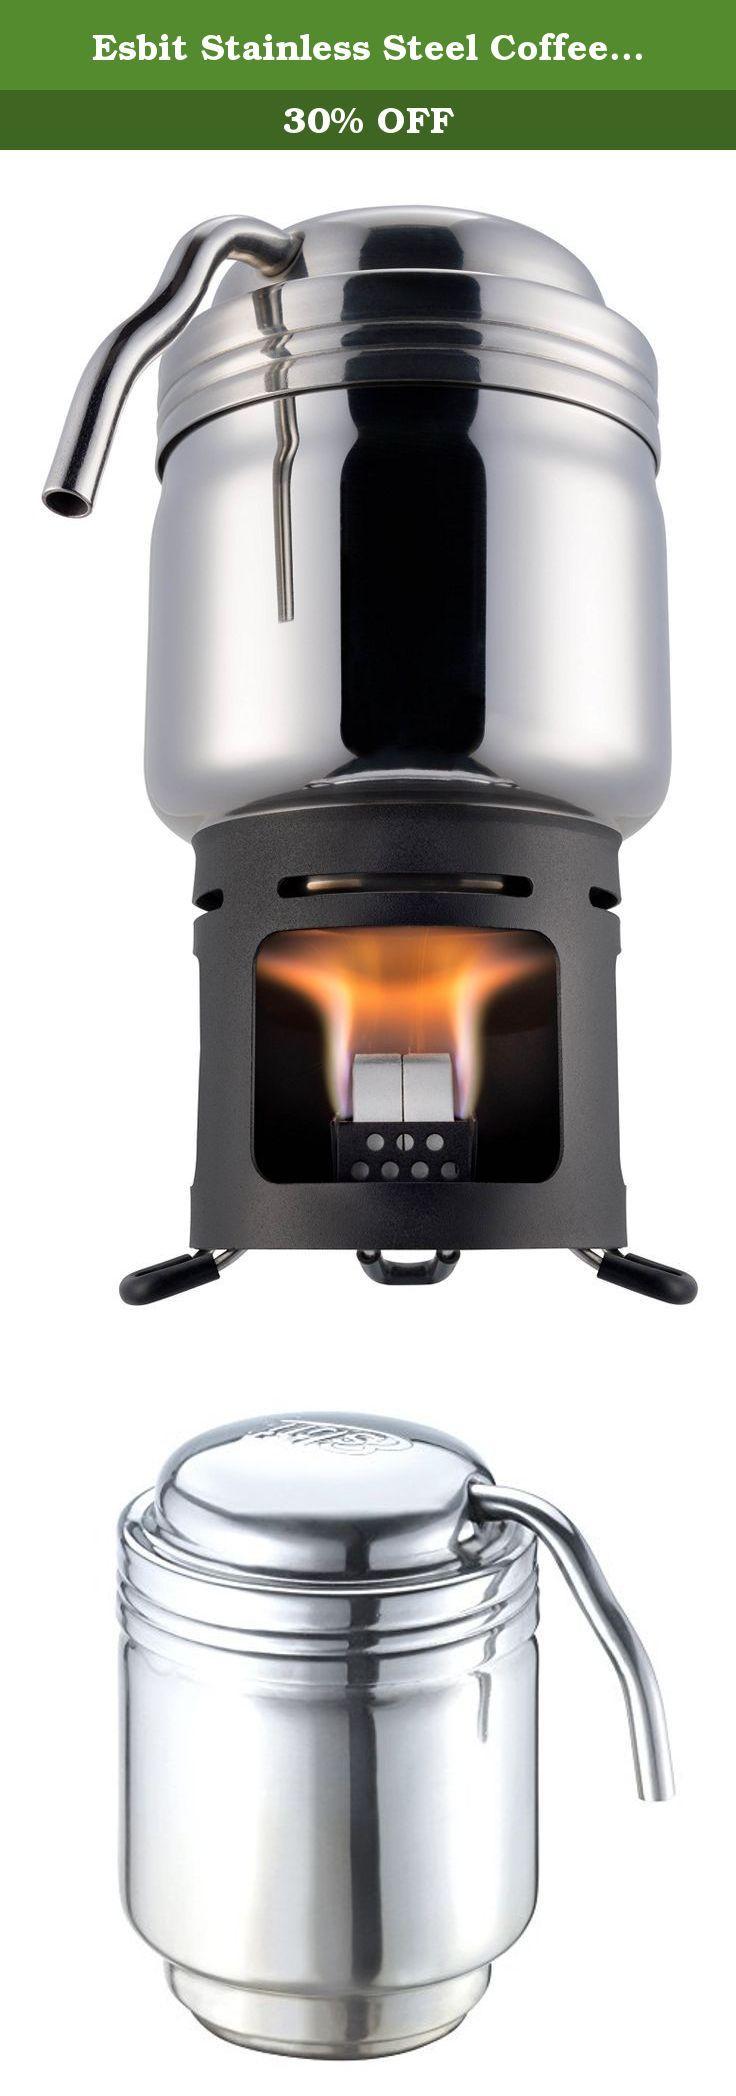 Esbit Coffee Maker Reviews : 1000+ ideas about Stainless Steel Coffee Maker on Pinterest Coffee maker reviews, Mr coffee ...